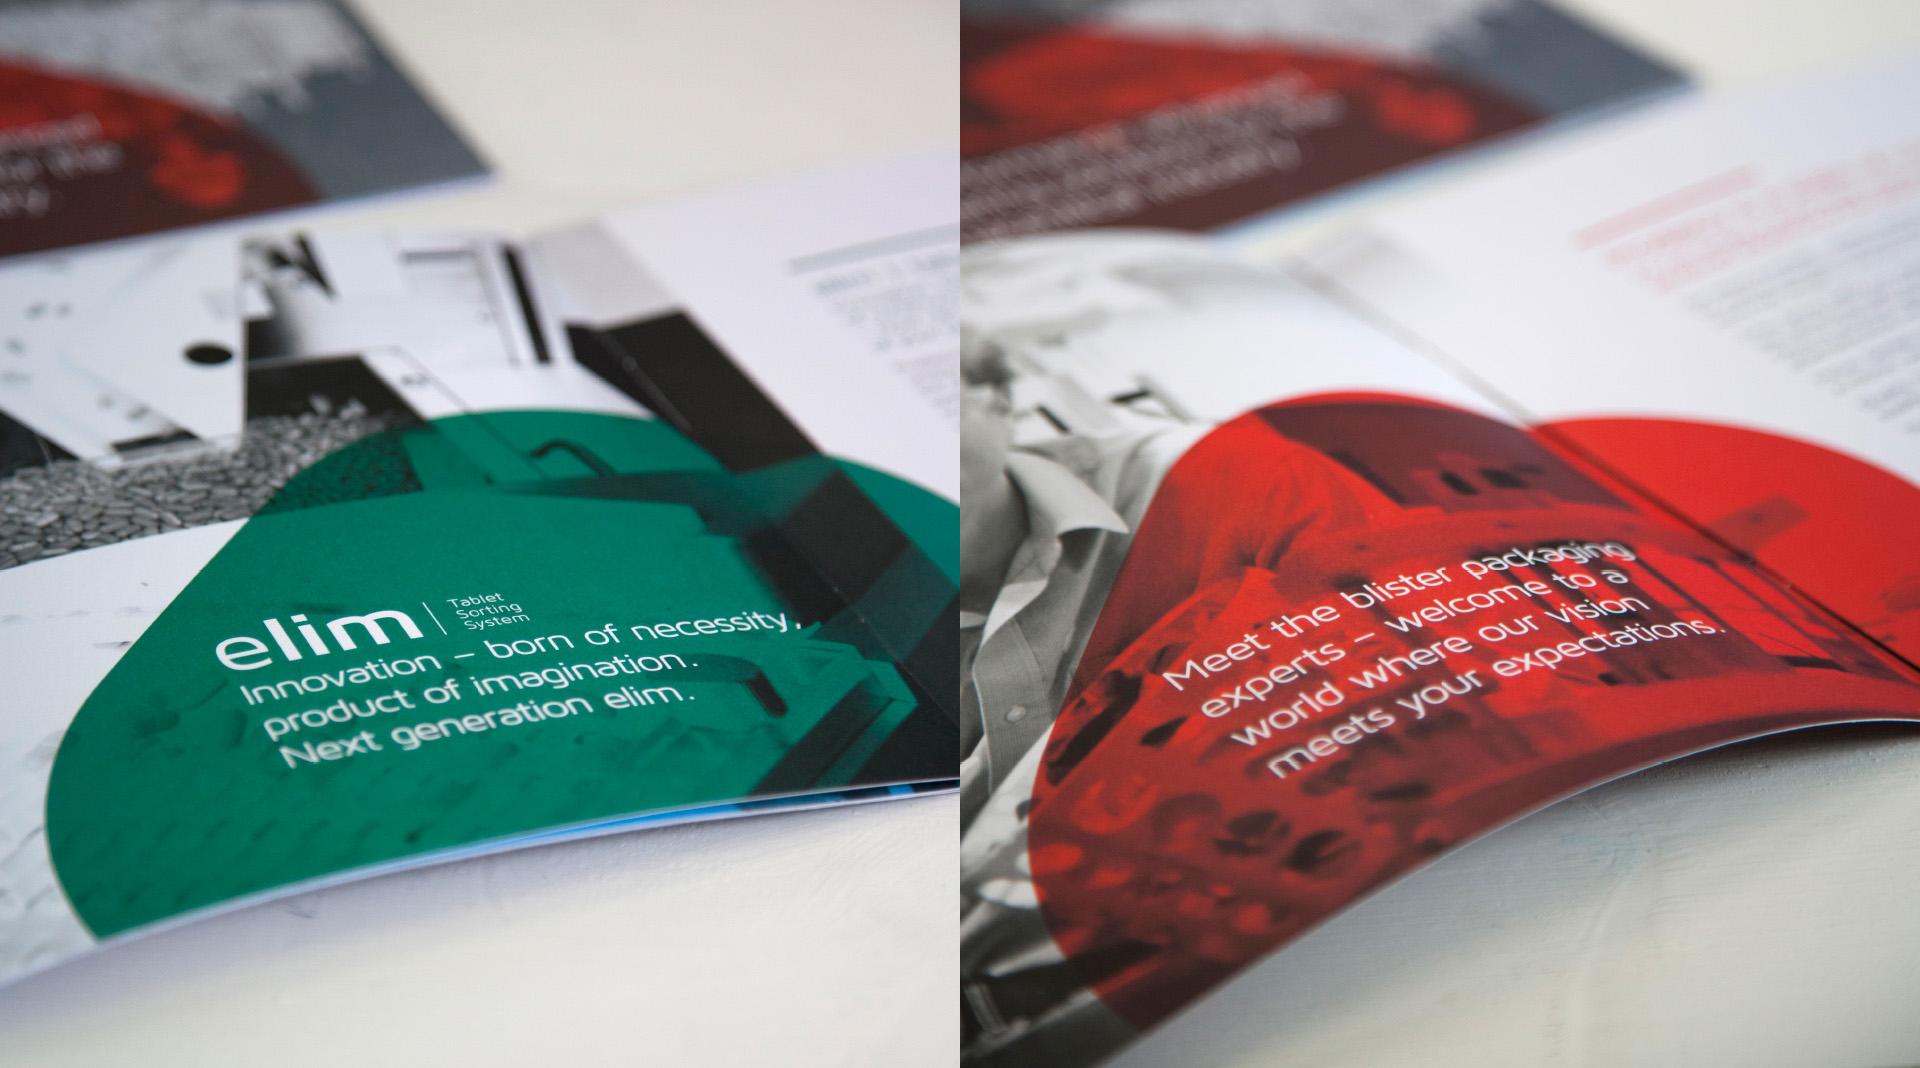 Prodieco Brochure Design details.